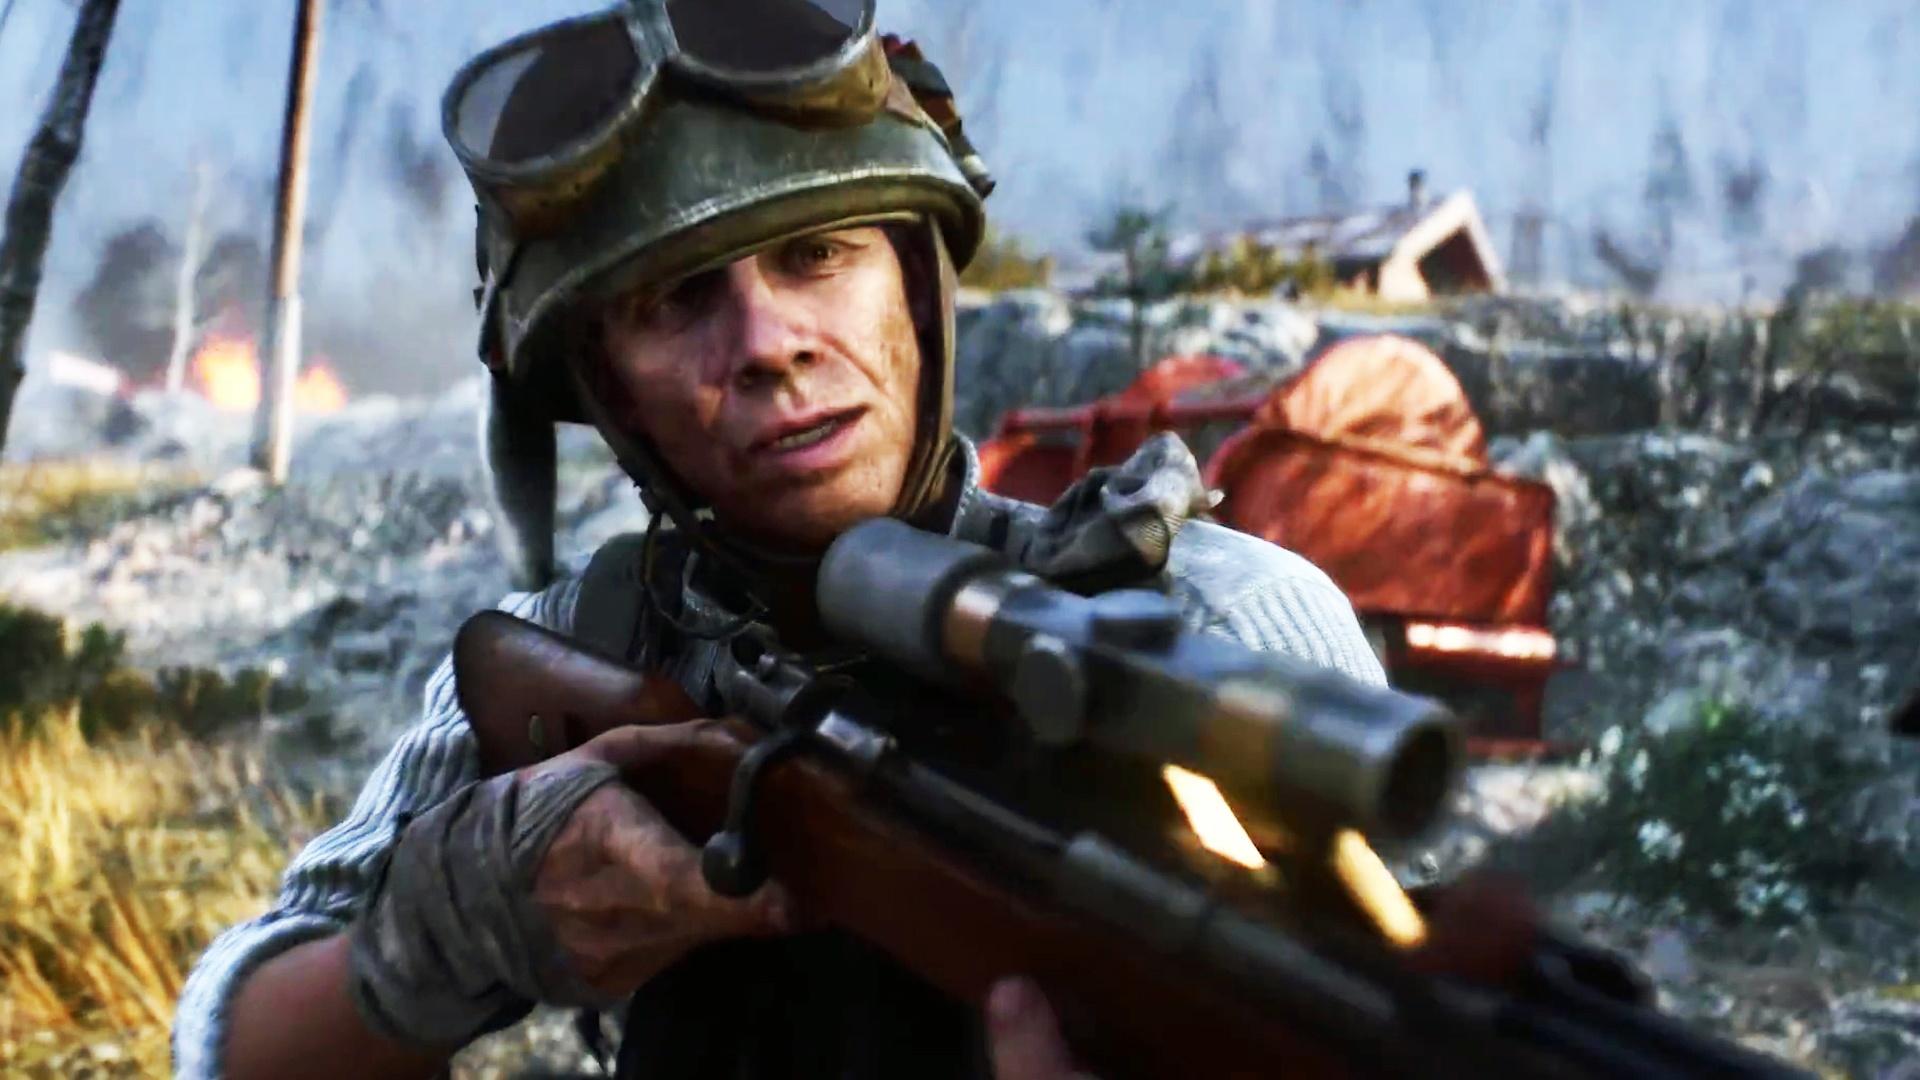 Battlefield 5: Firestorm ab sofort spielbar - Alle Infos zum